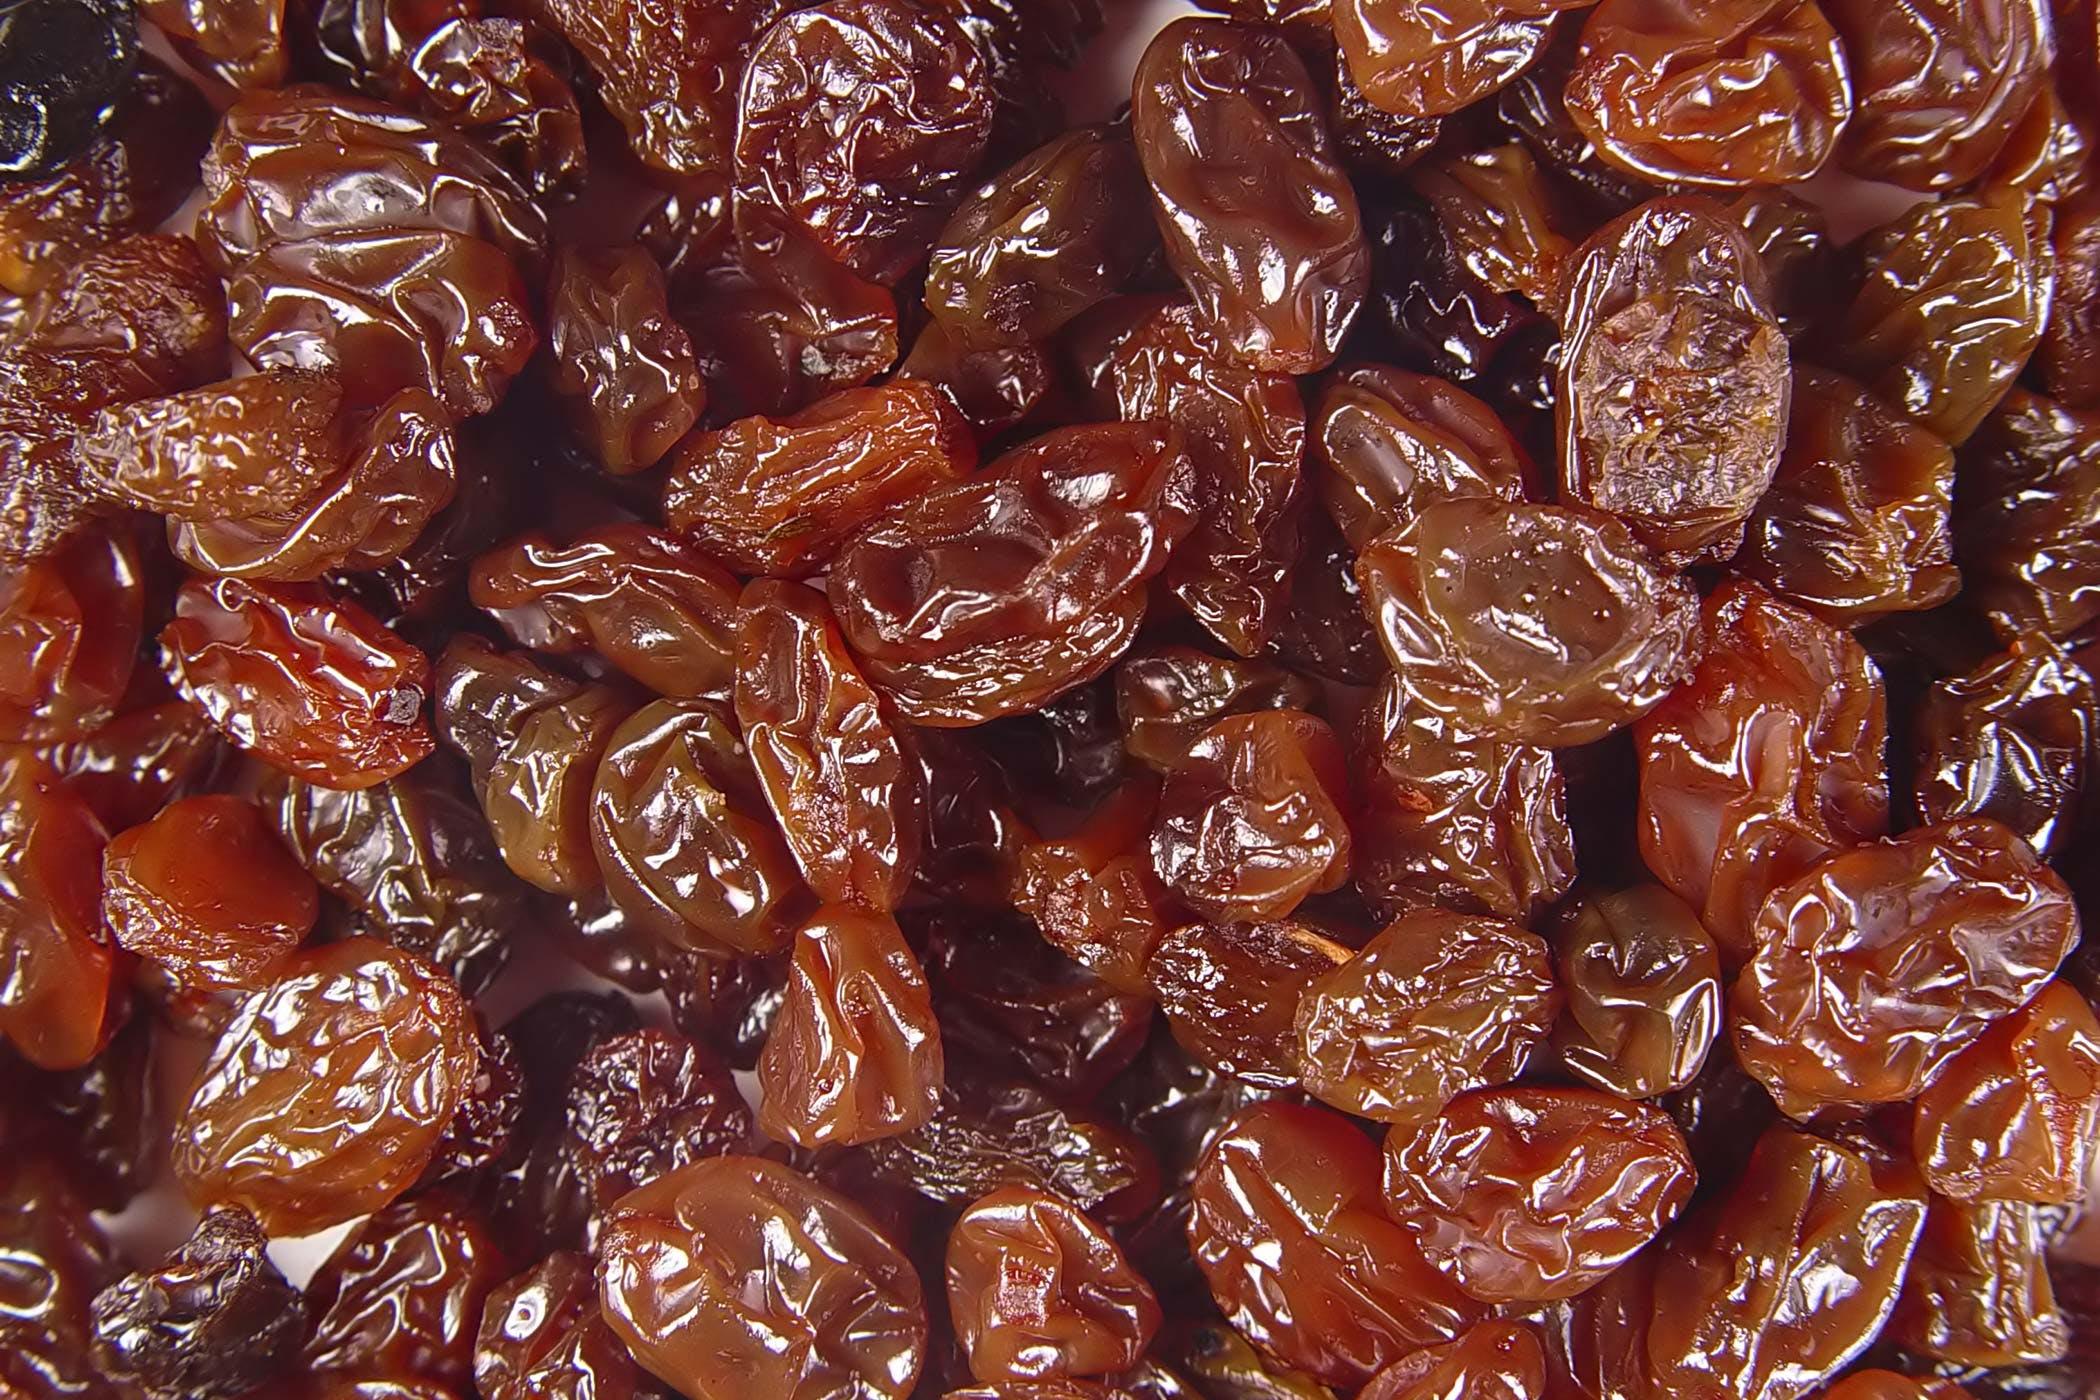 What To Do When Dog Eats Raisins